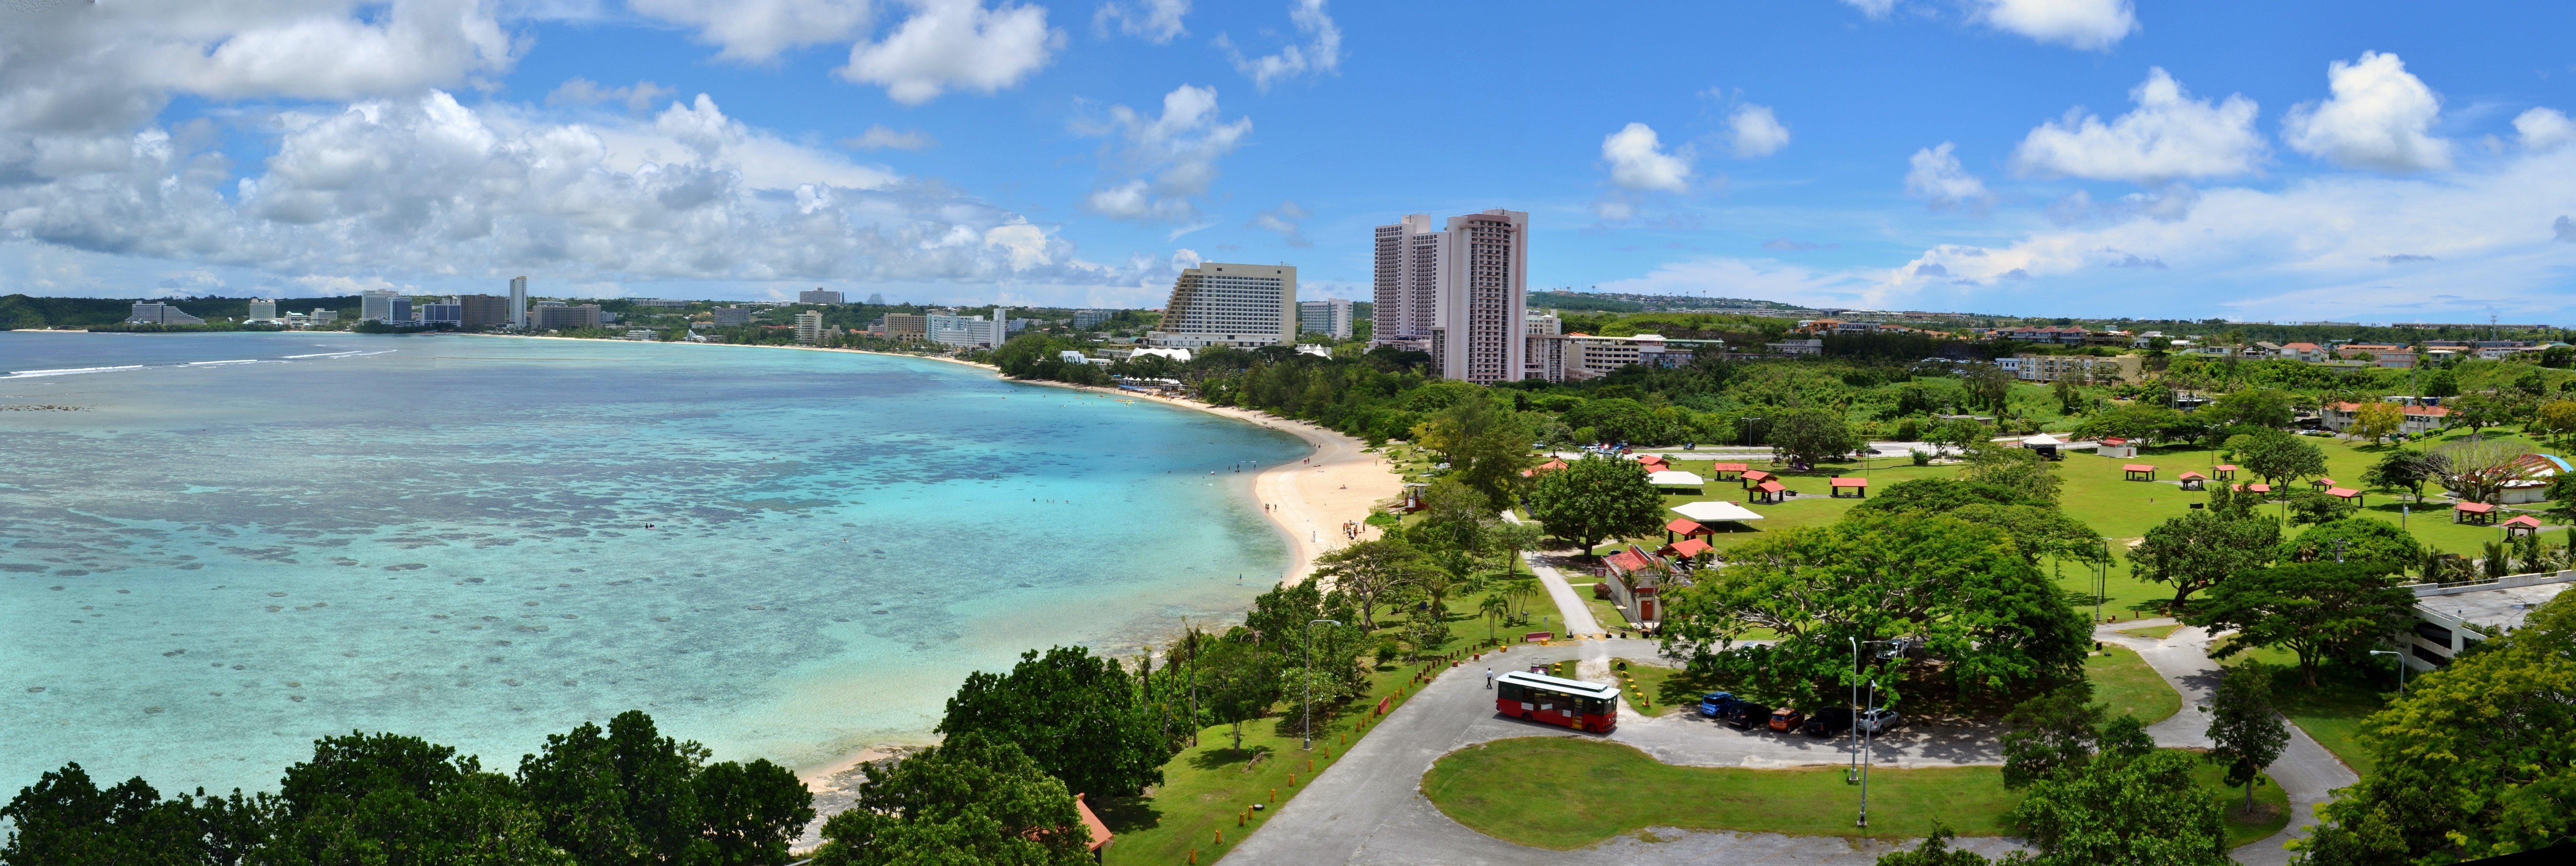 The Best Things to do on Guam, ヴァレーオブラテ ,写真好きな人と繋がりたい #インスタ映え ,アドベンチャーリバーボートクルーズ ,アドベンチャーカヤック #スタンドアップパドルボーディング #旅行,ファインダー越しの私の世界 Valley of the Latte Adventure Park, Guam's best tours, guam tours. best family tour on guam